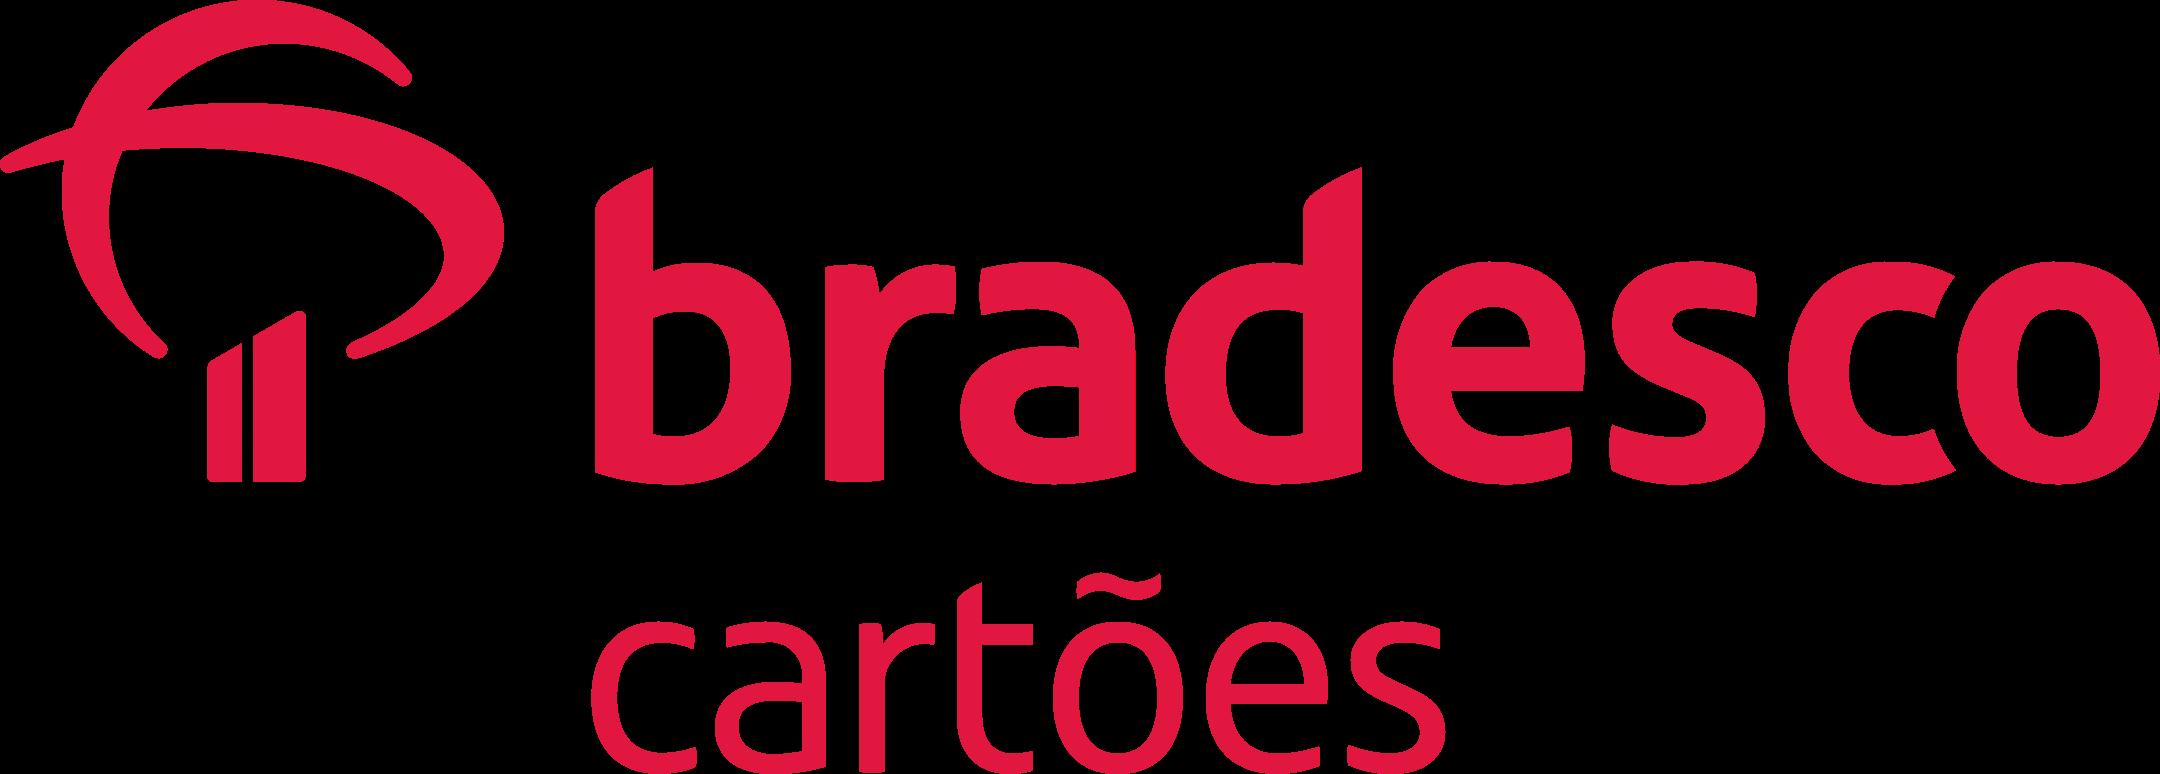 bradesco cartoes logo 1 - Bradesco Cartões Logo